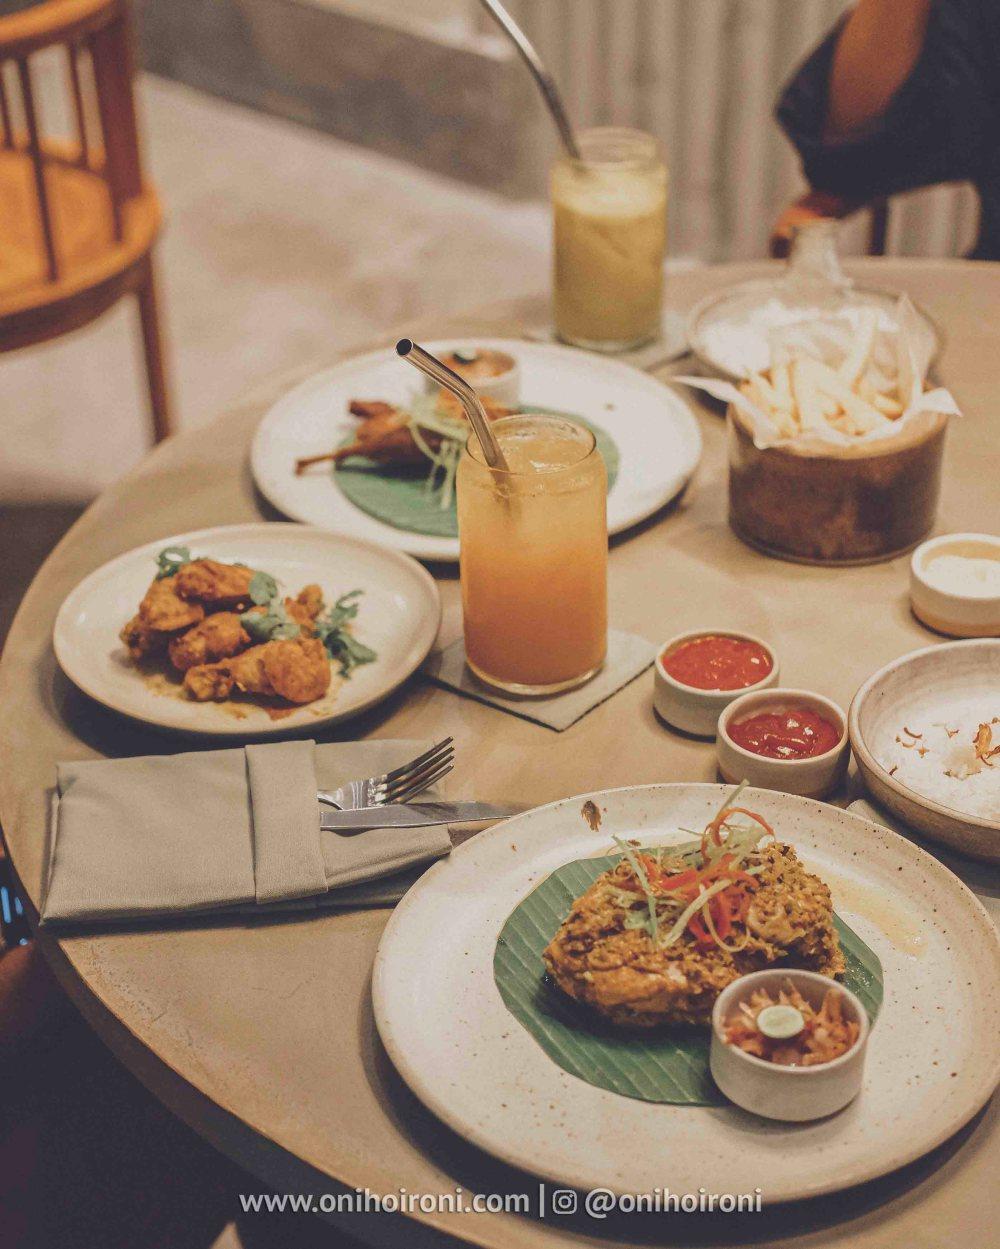 5 food jatayu restoreview artotel haniman ubud oni hoironi